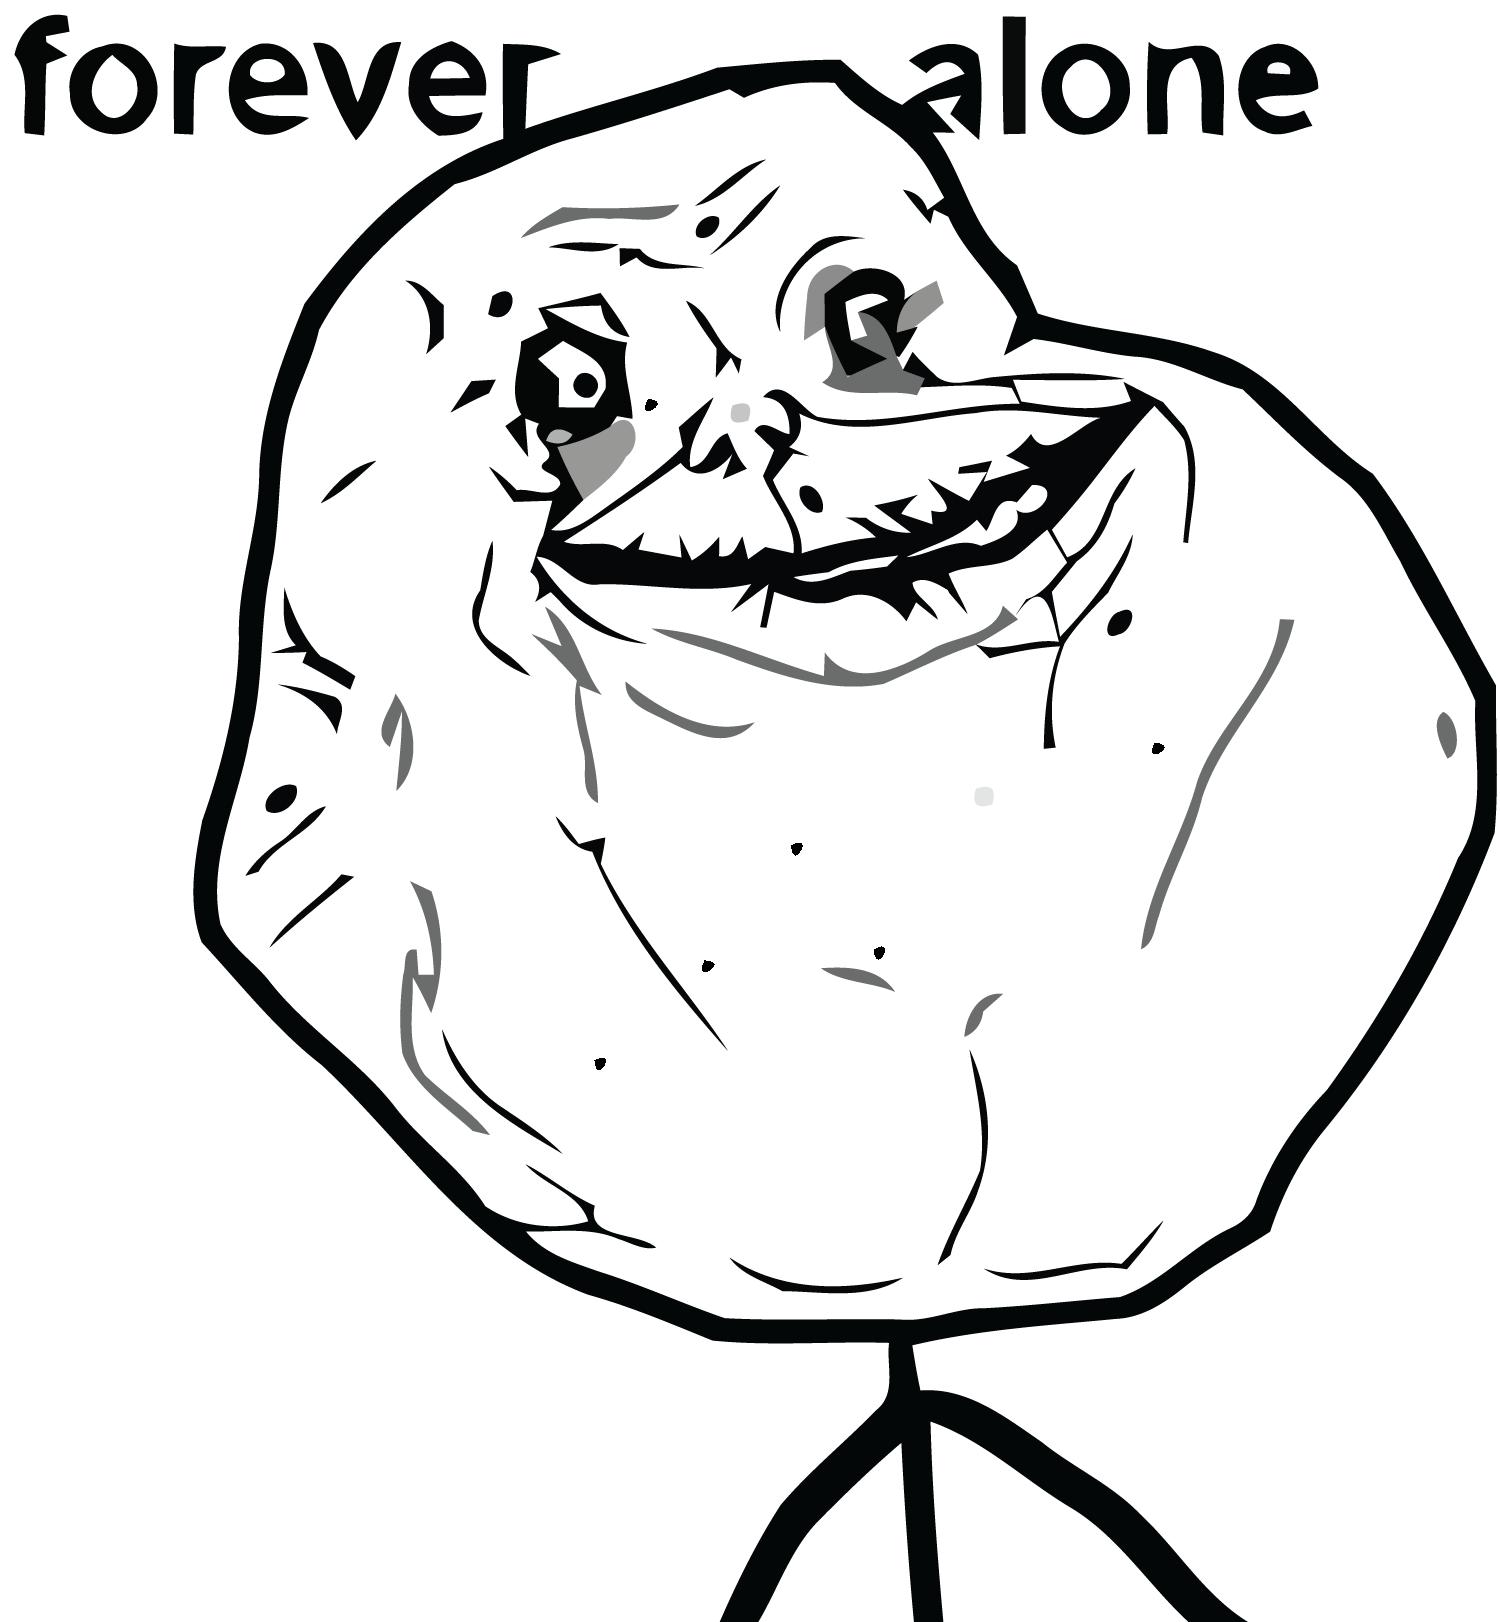 Sad Alone Memes: Image - Sad-forever-alone-l.png